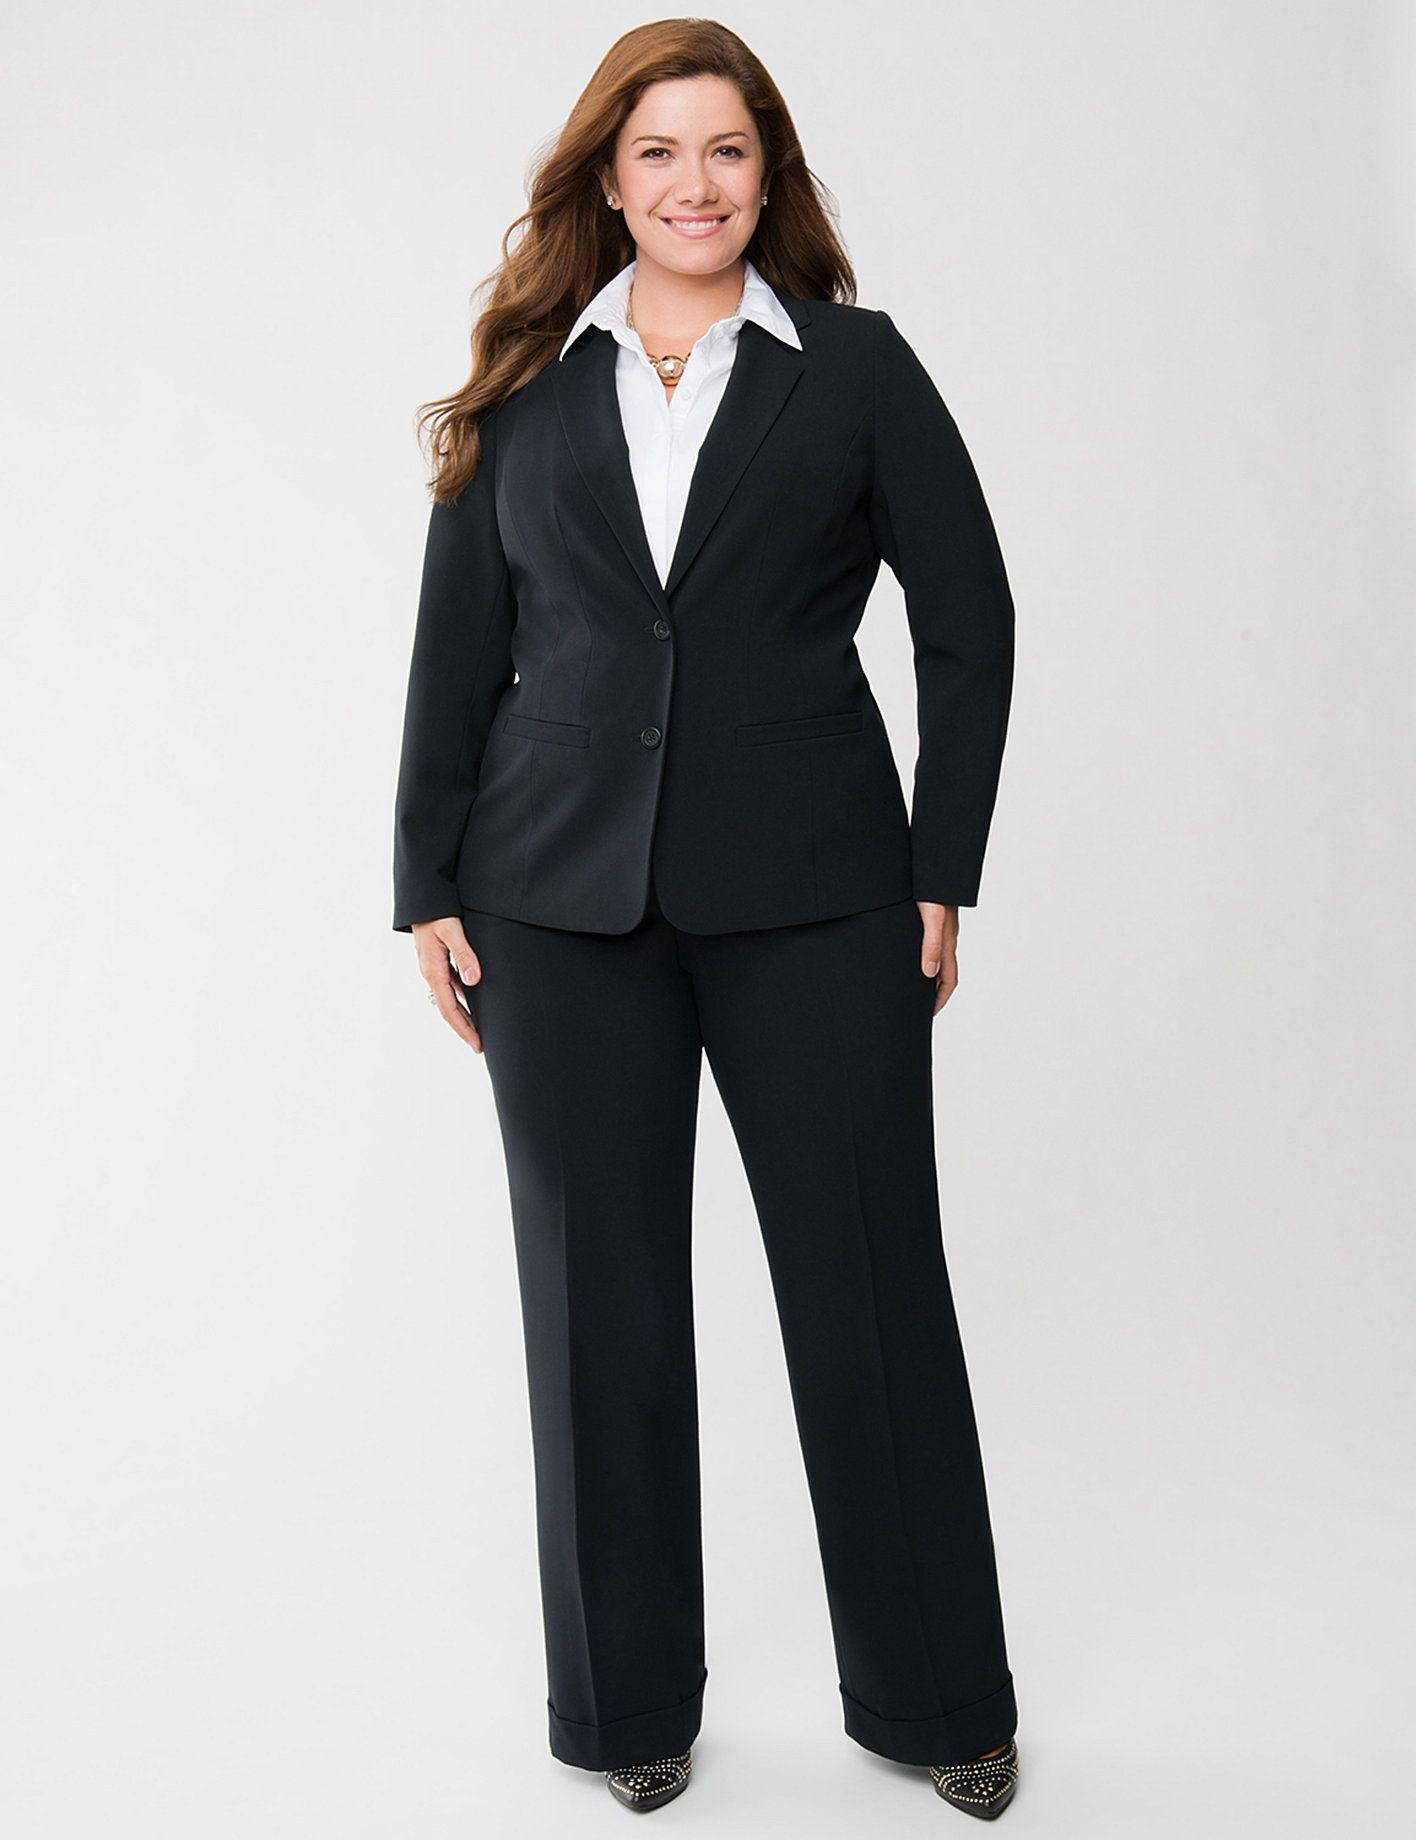 womens tops  lane bryant  a plus size business woman